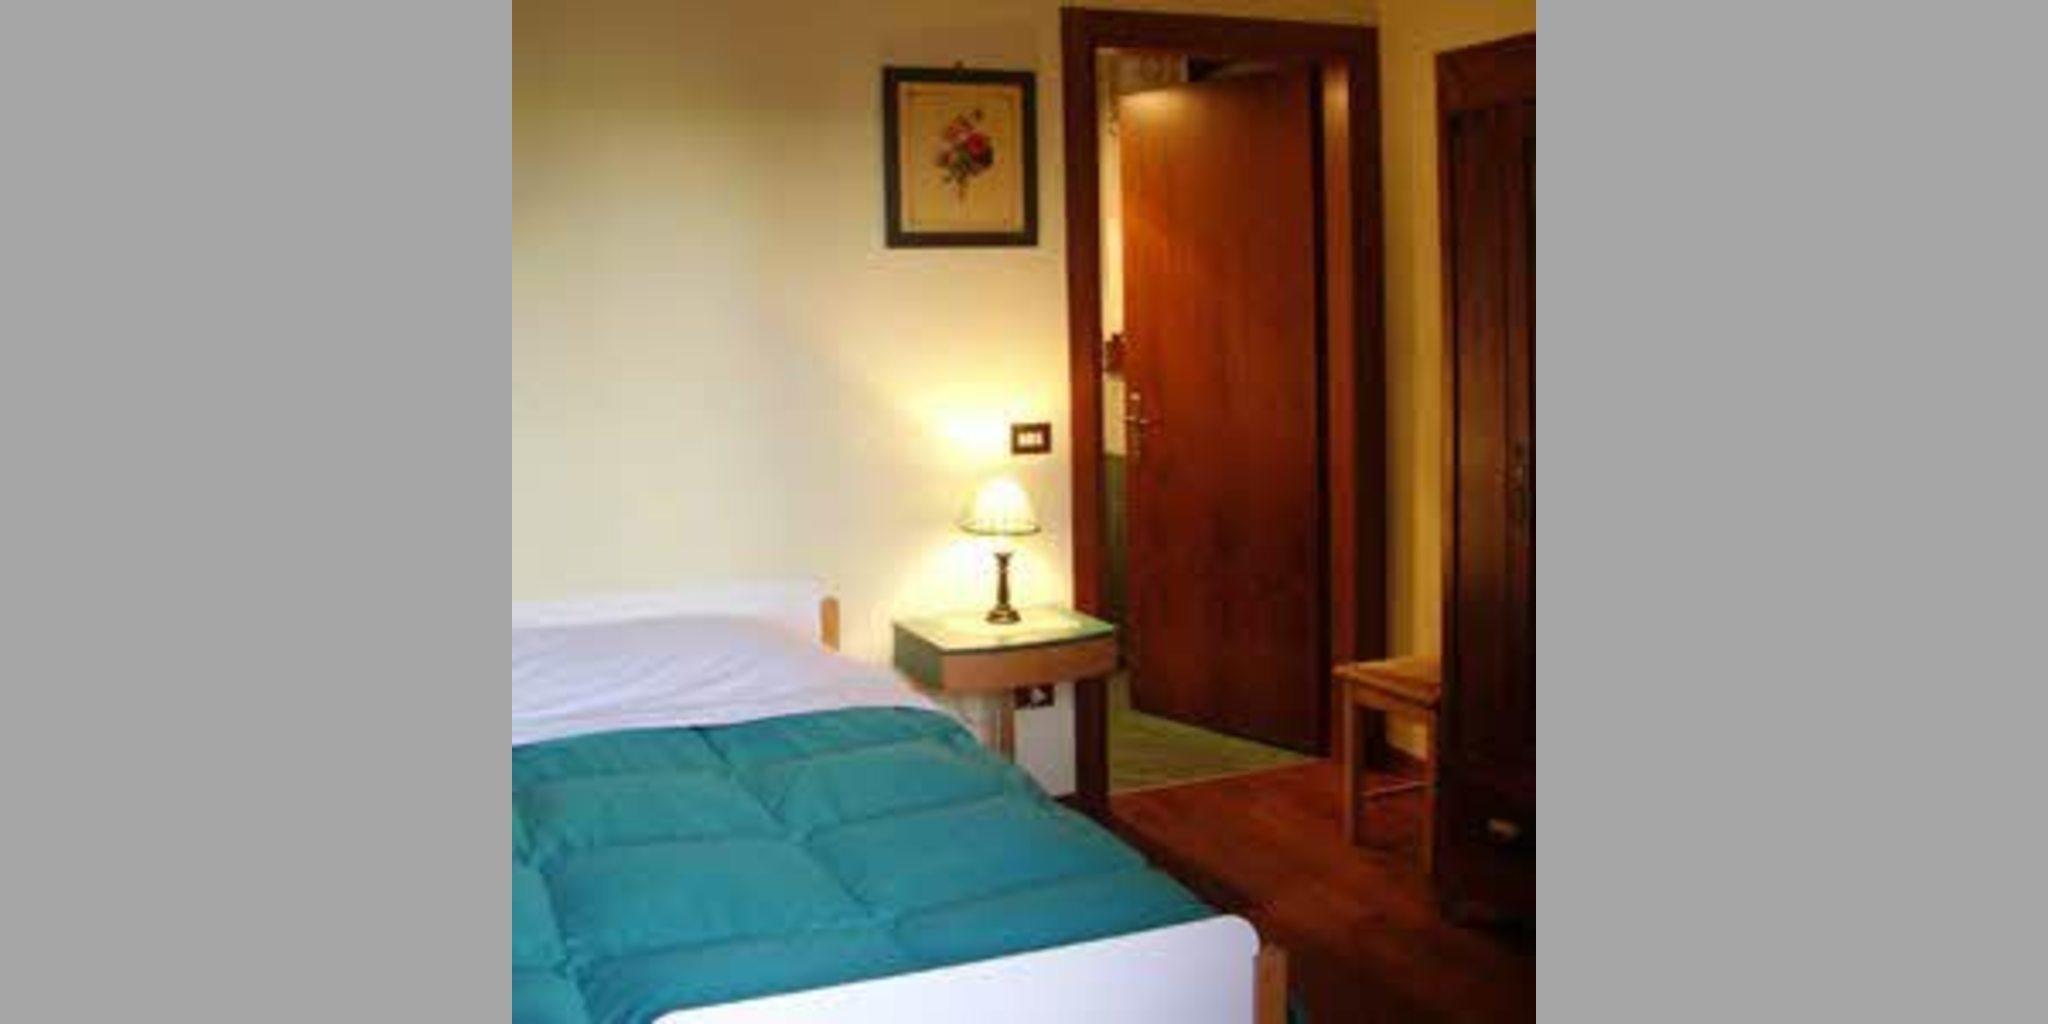 Bed & Breakfast Padova - Zacco